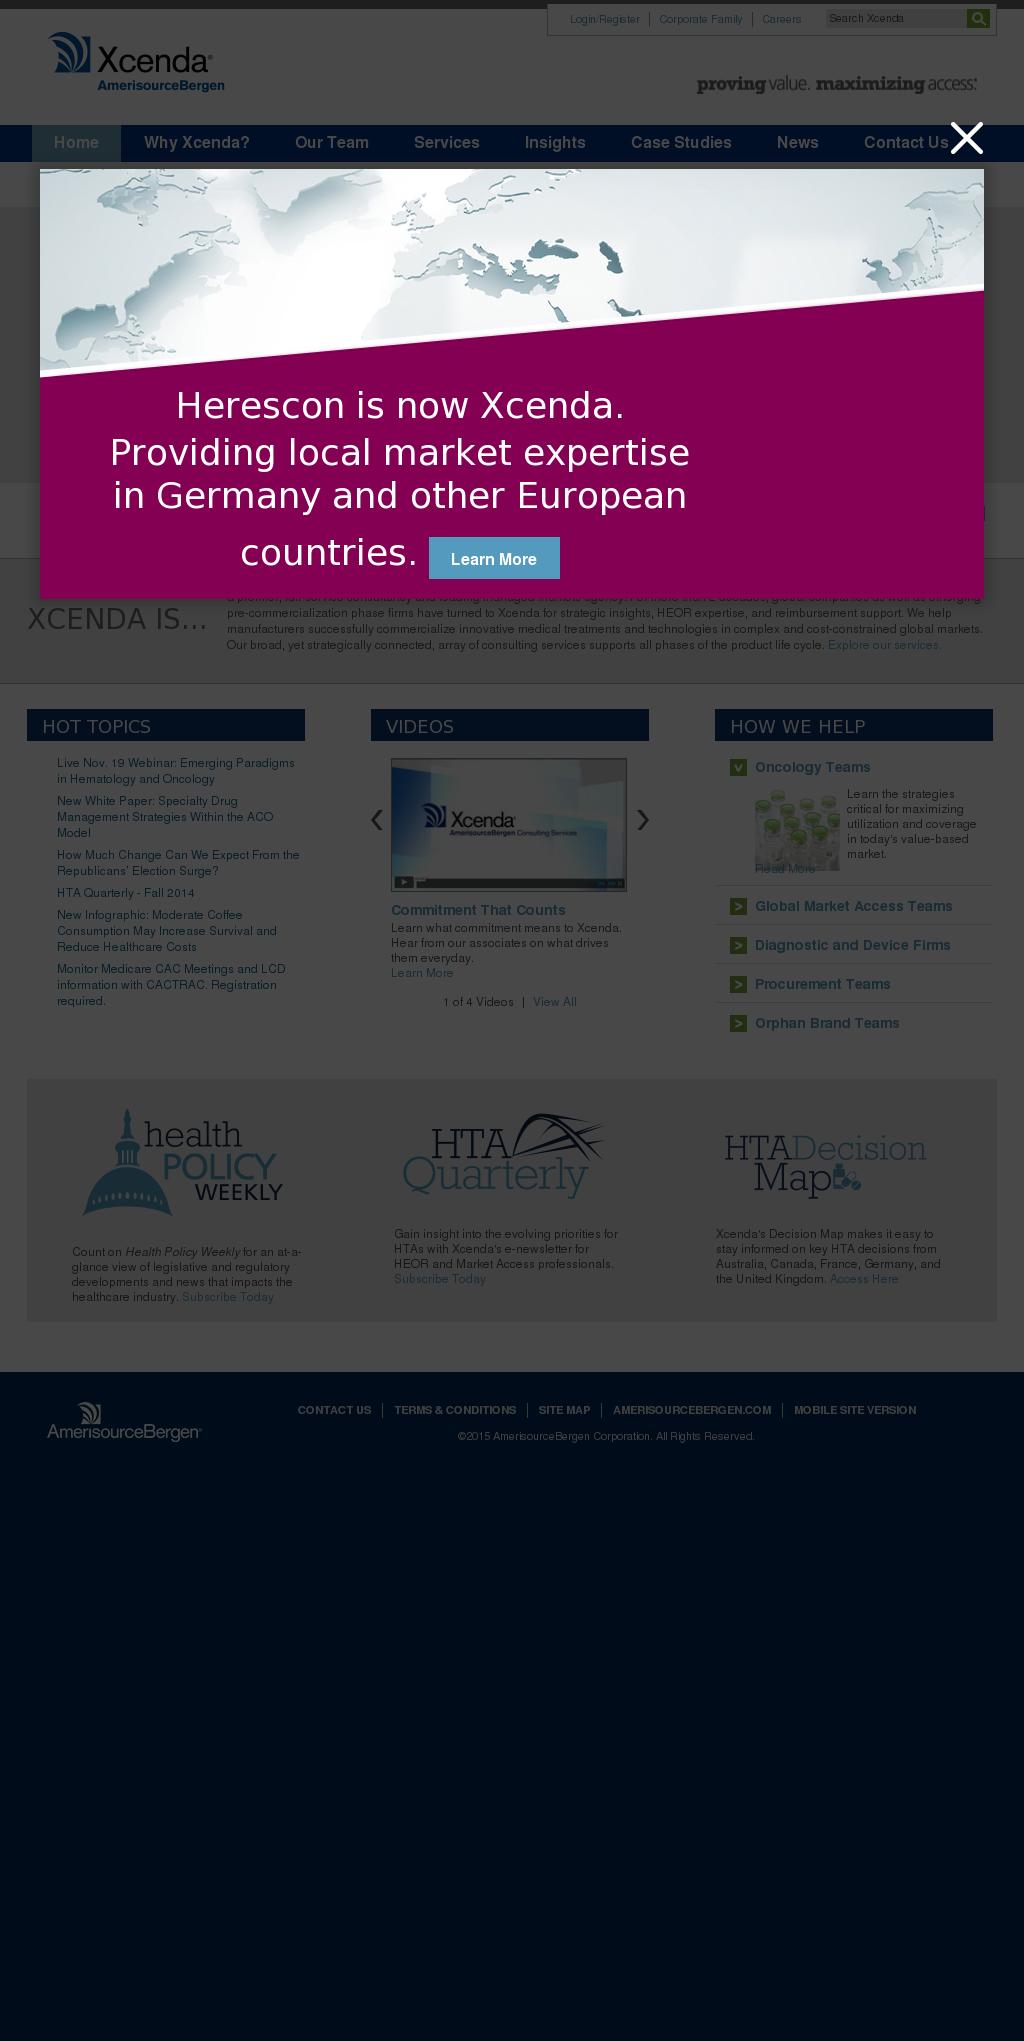 Xcenda Competitors, Revenue and Employees - Owler Company Profile